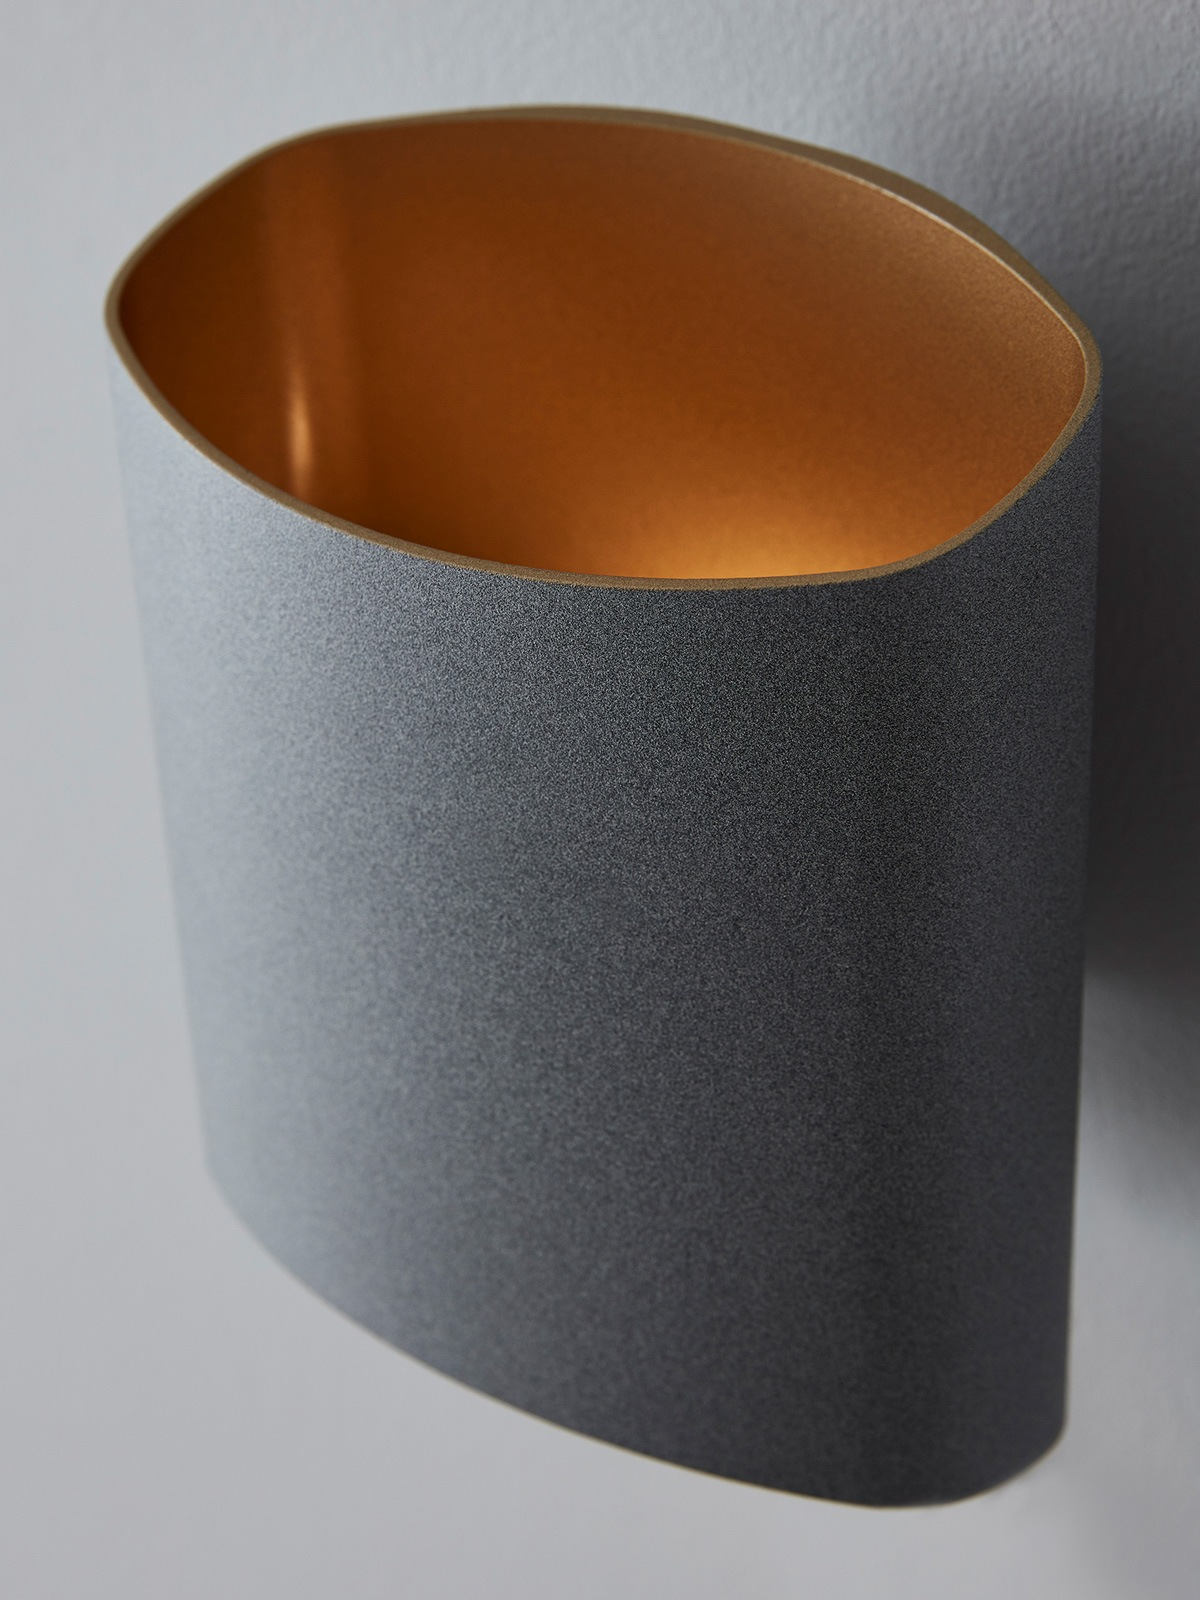 Belid Sinne Wandleuchte DesignOrt Onlineshop Lampen Berlin